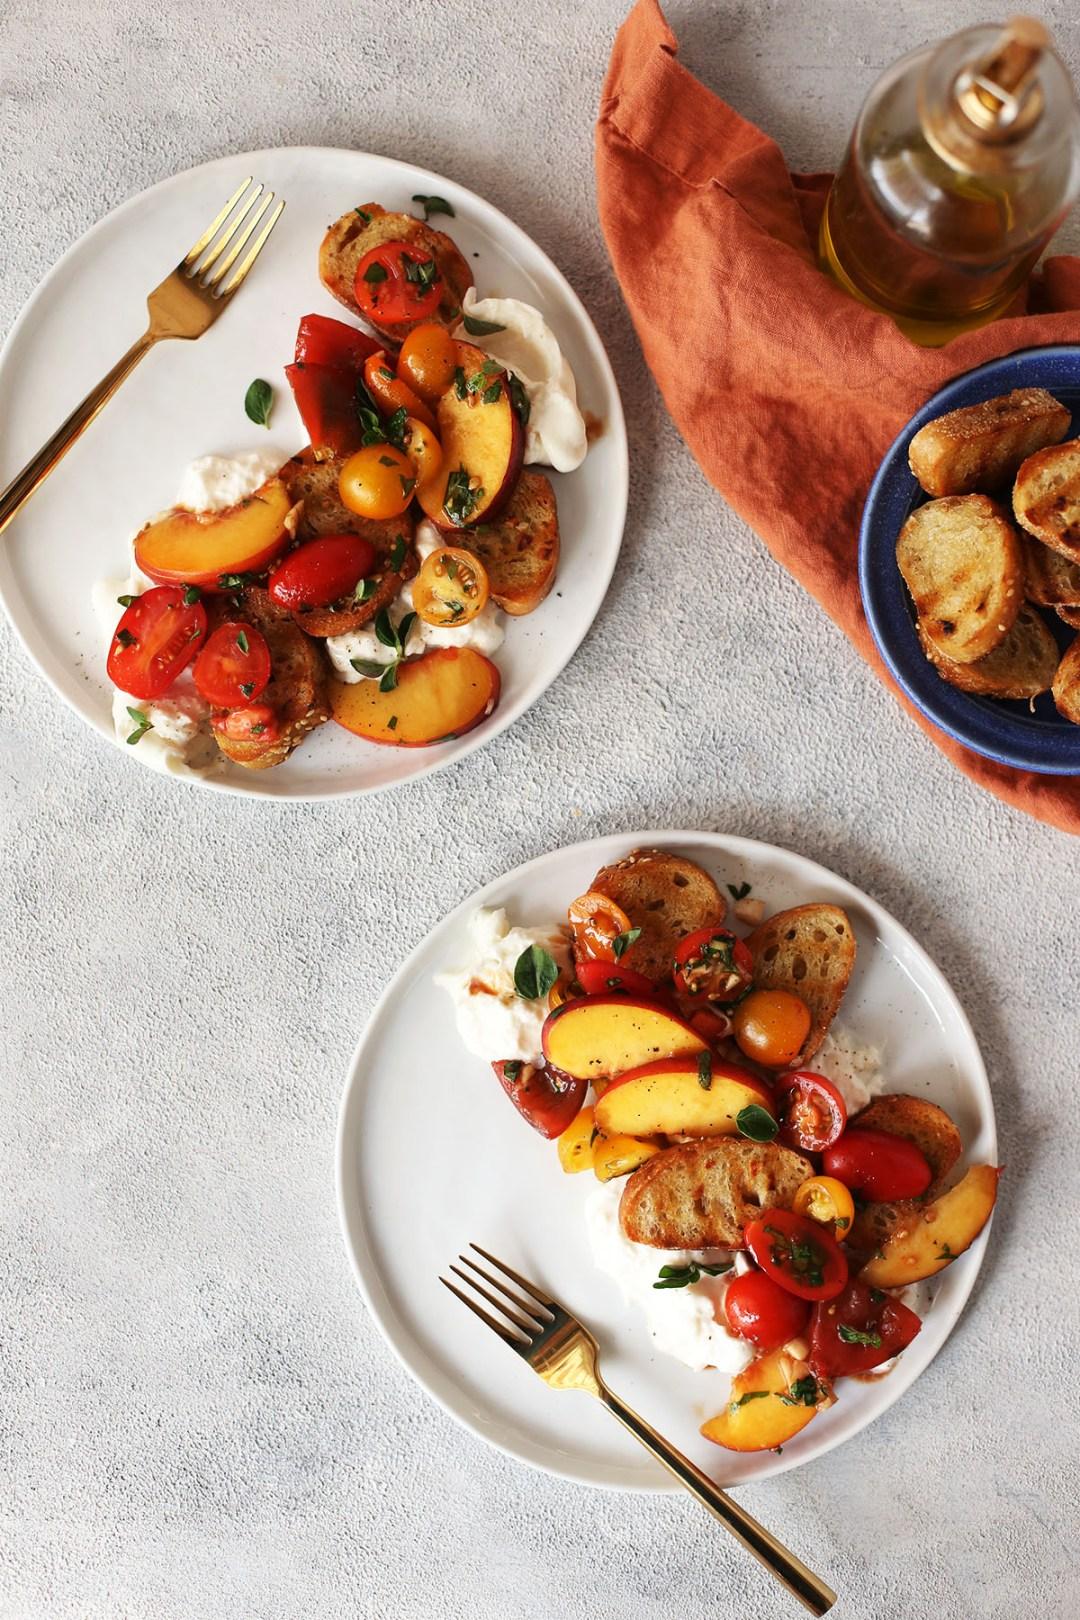 Peach Caprese Crostini Salad with Buratta